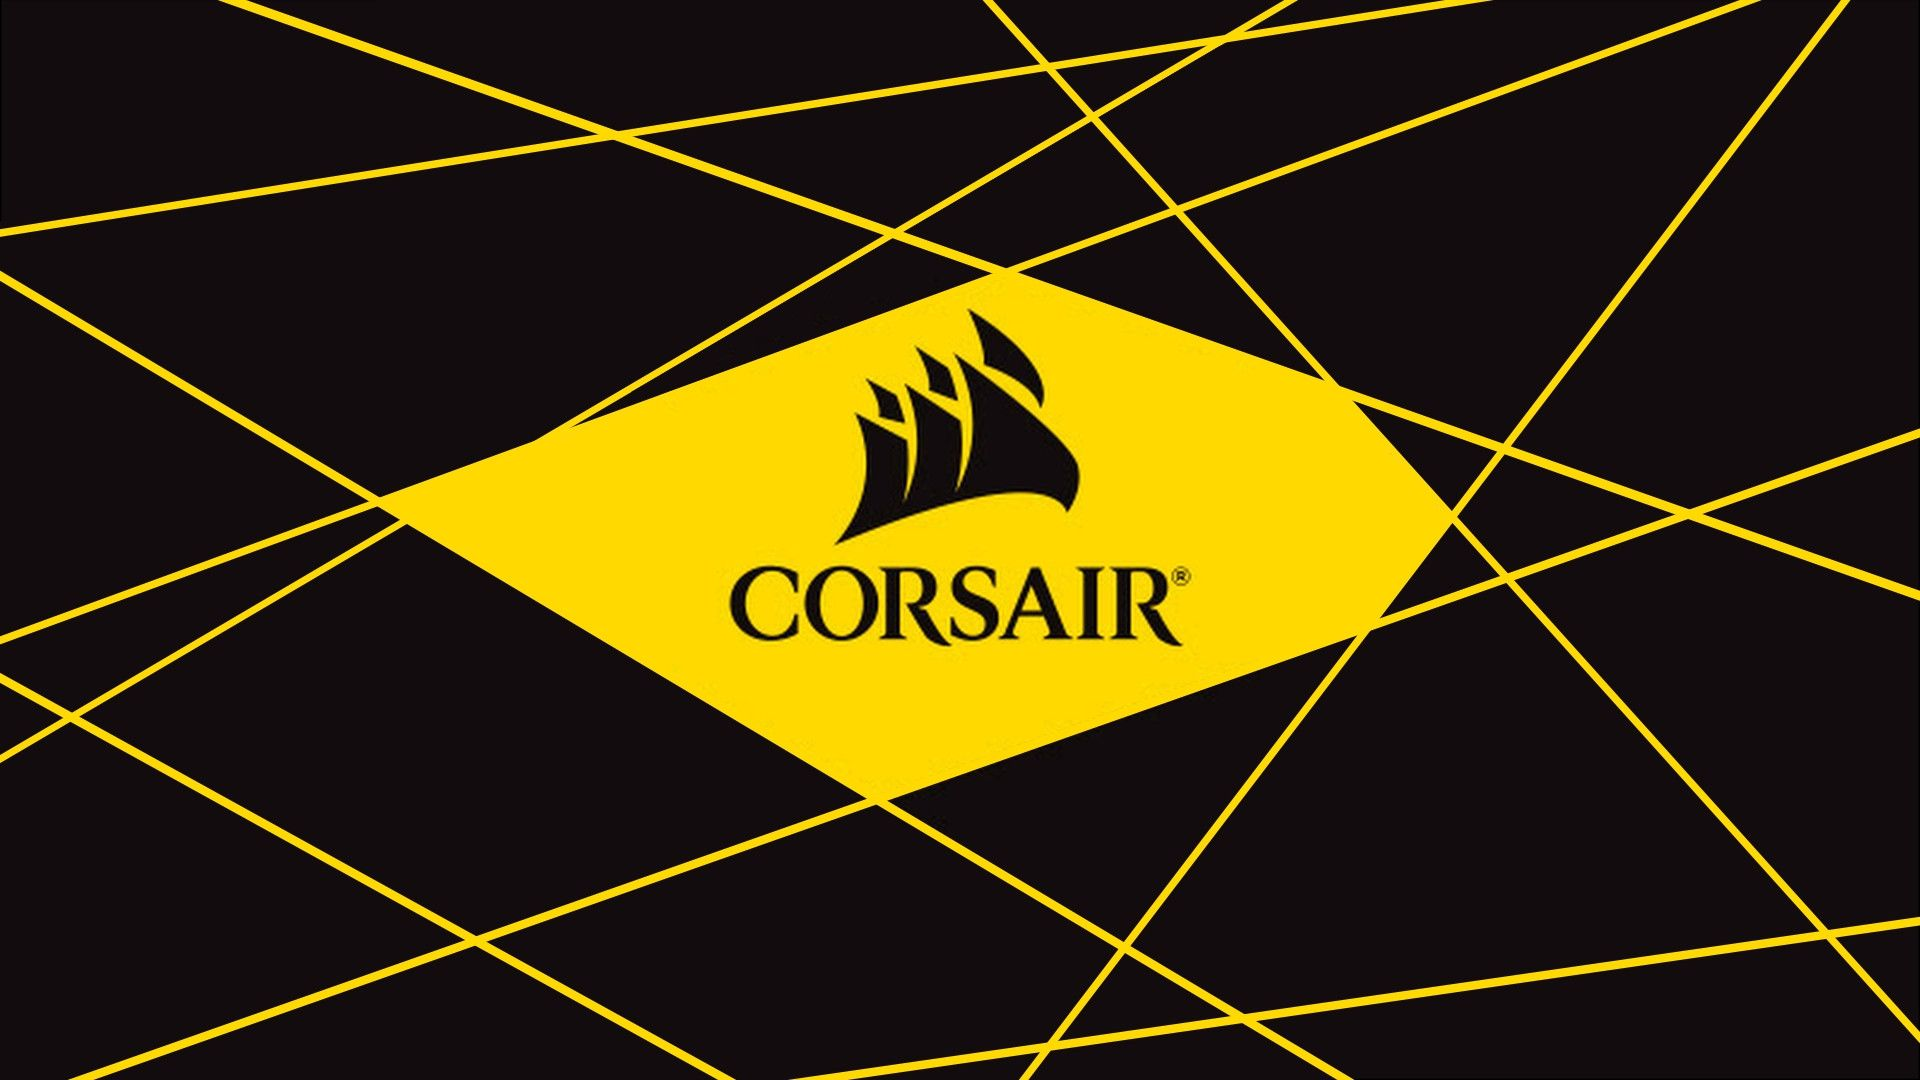 corsair 1920x1080 wallpaper